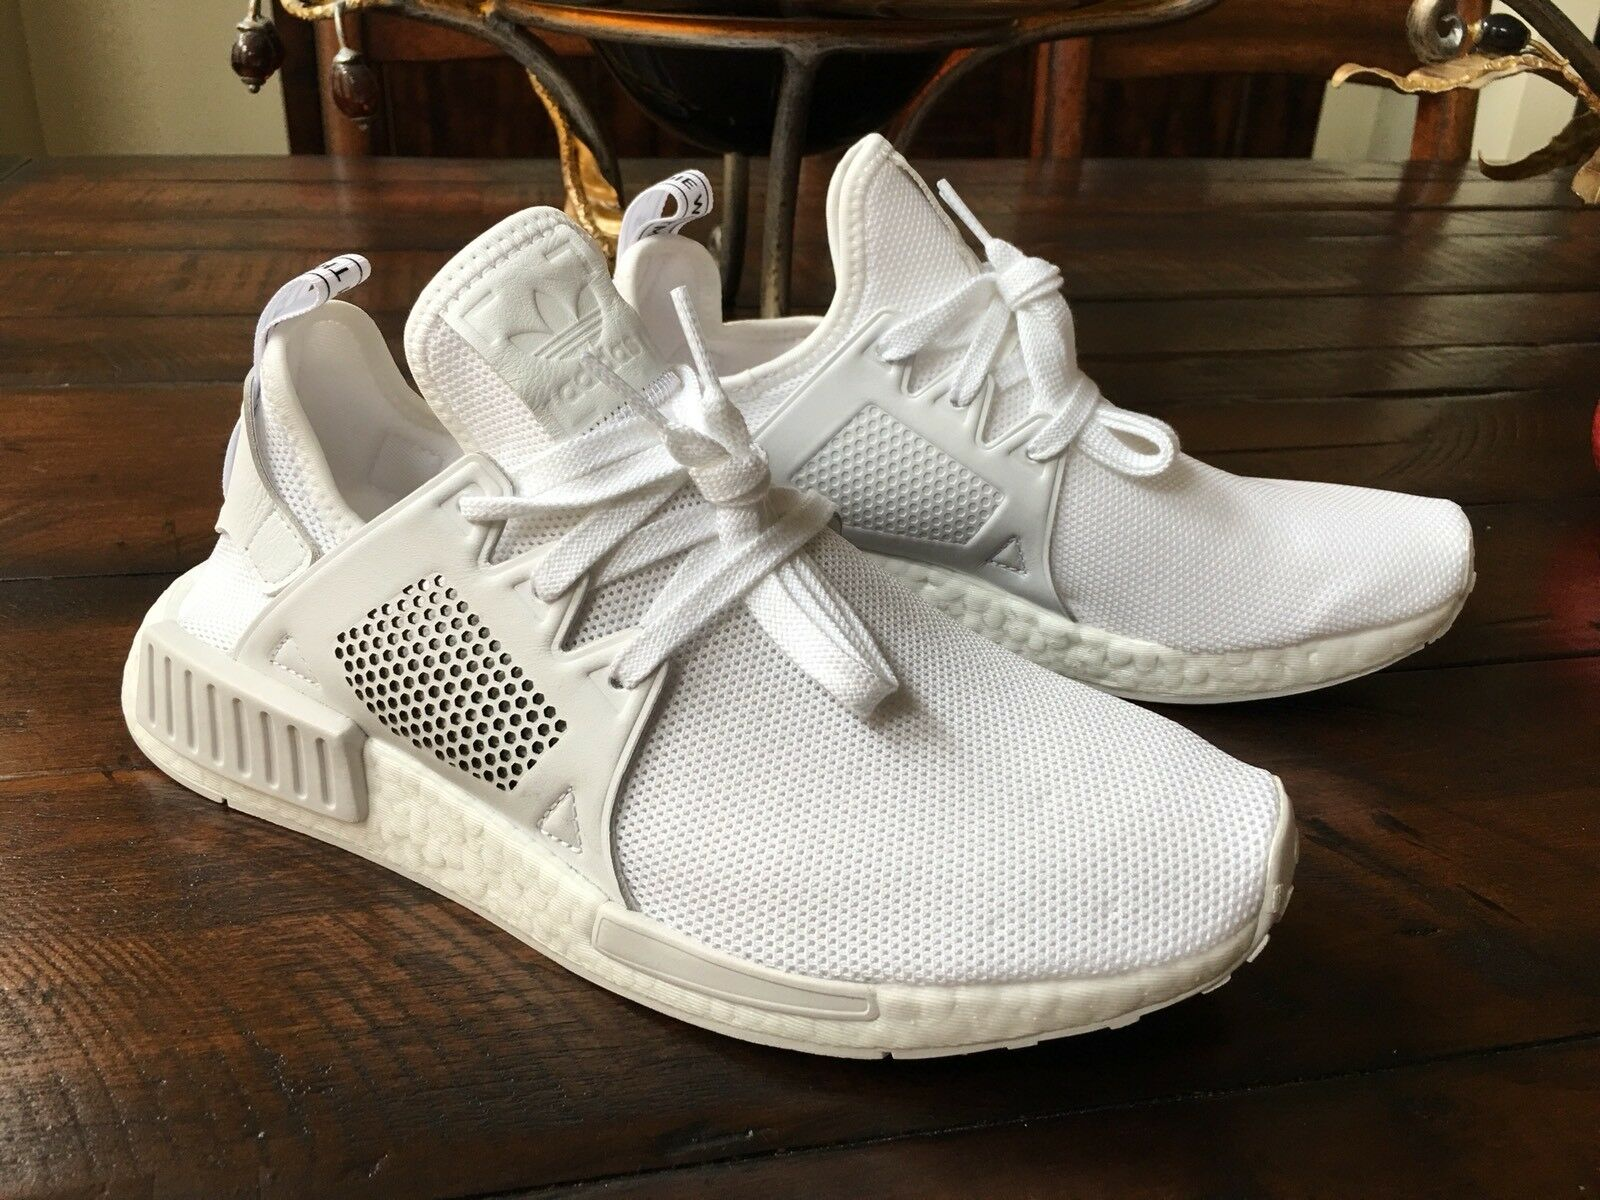 Nuevo ADIDAS BY9922 NMD XR1 TRIPLE blancoo BOOST Running Zapatos EE. UU. 9 100% Auténticas